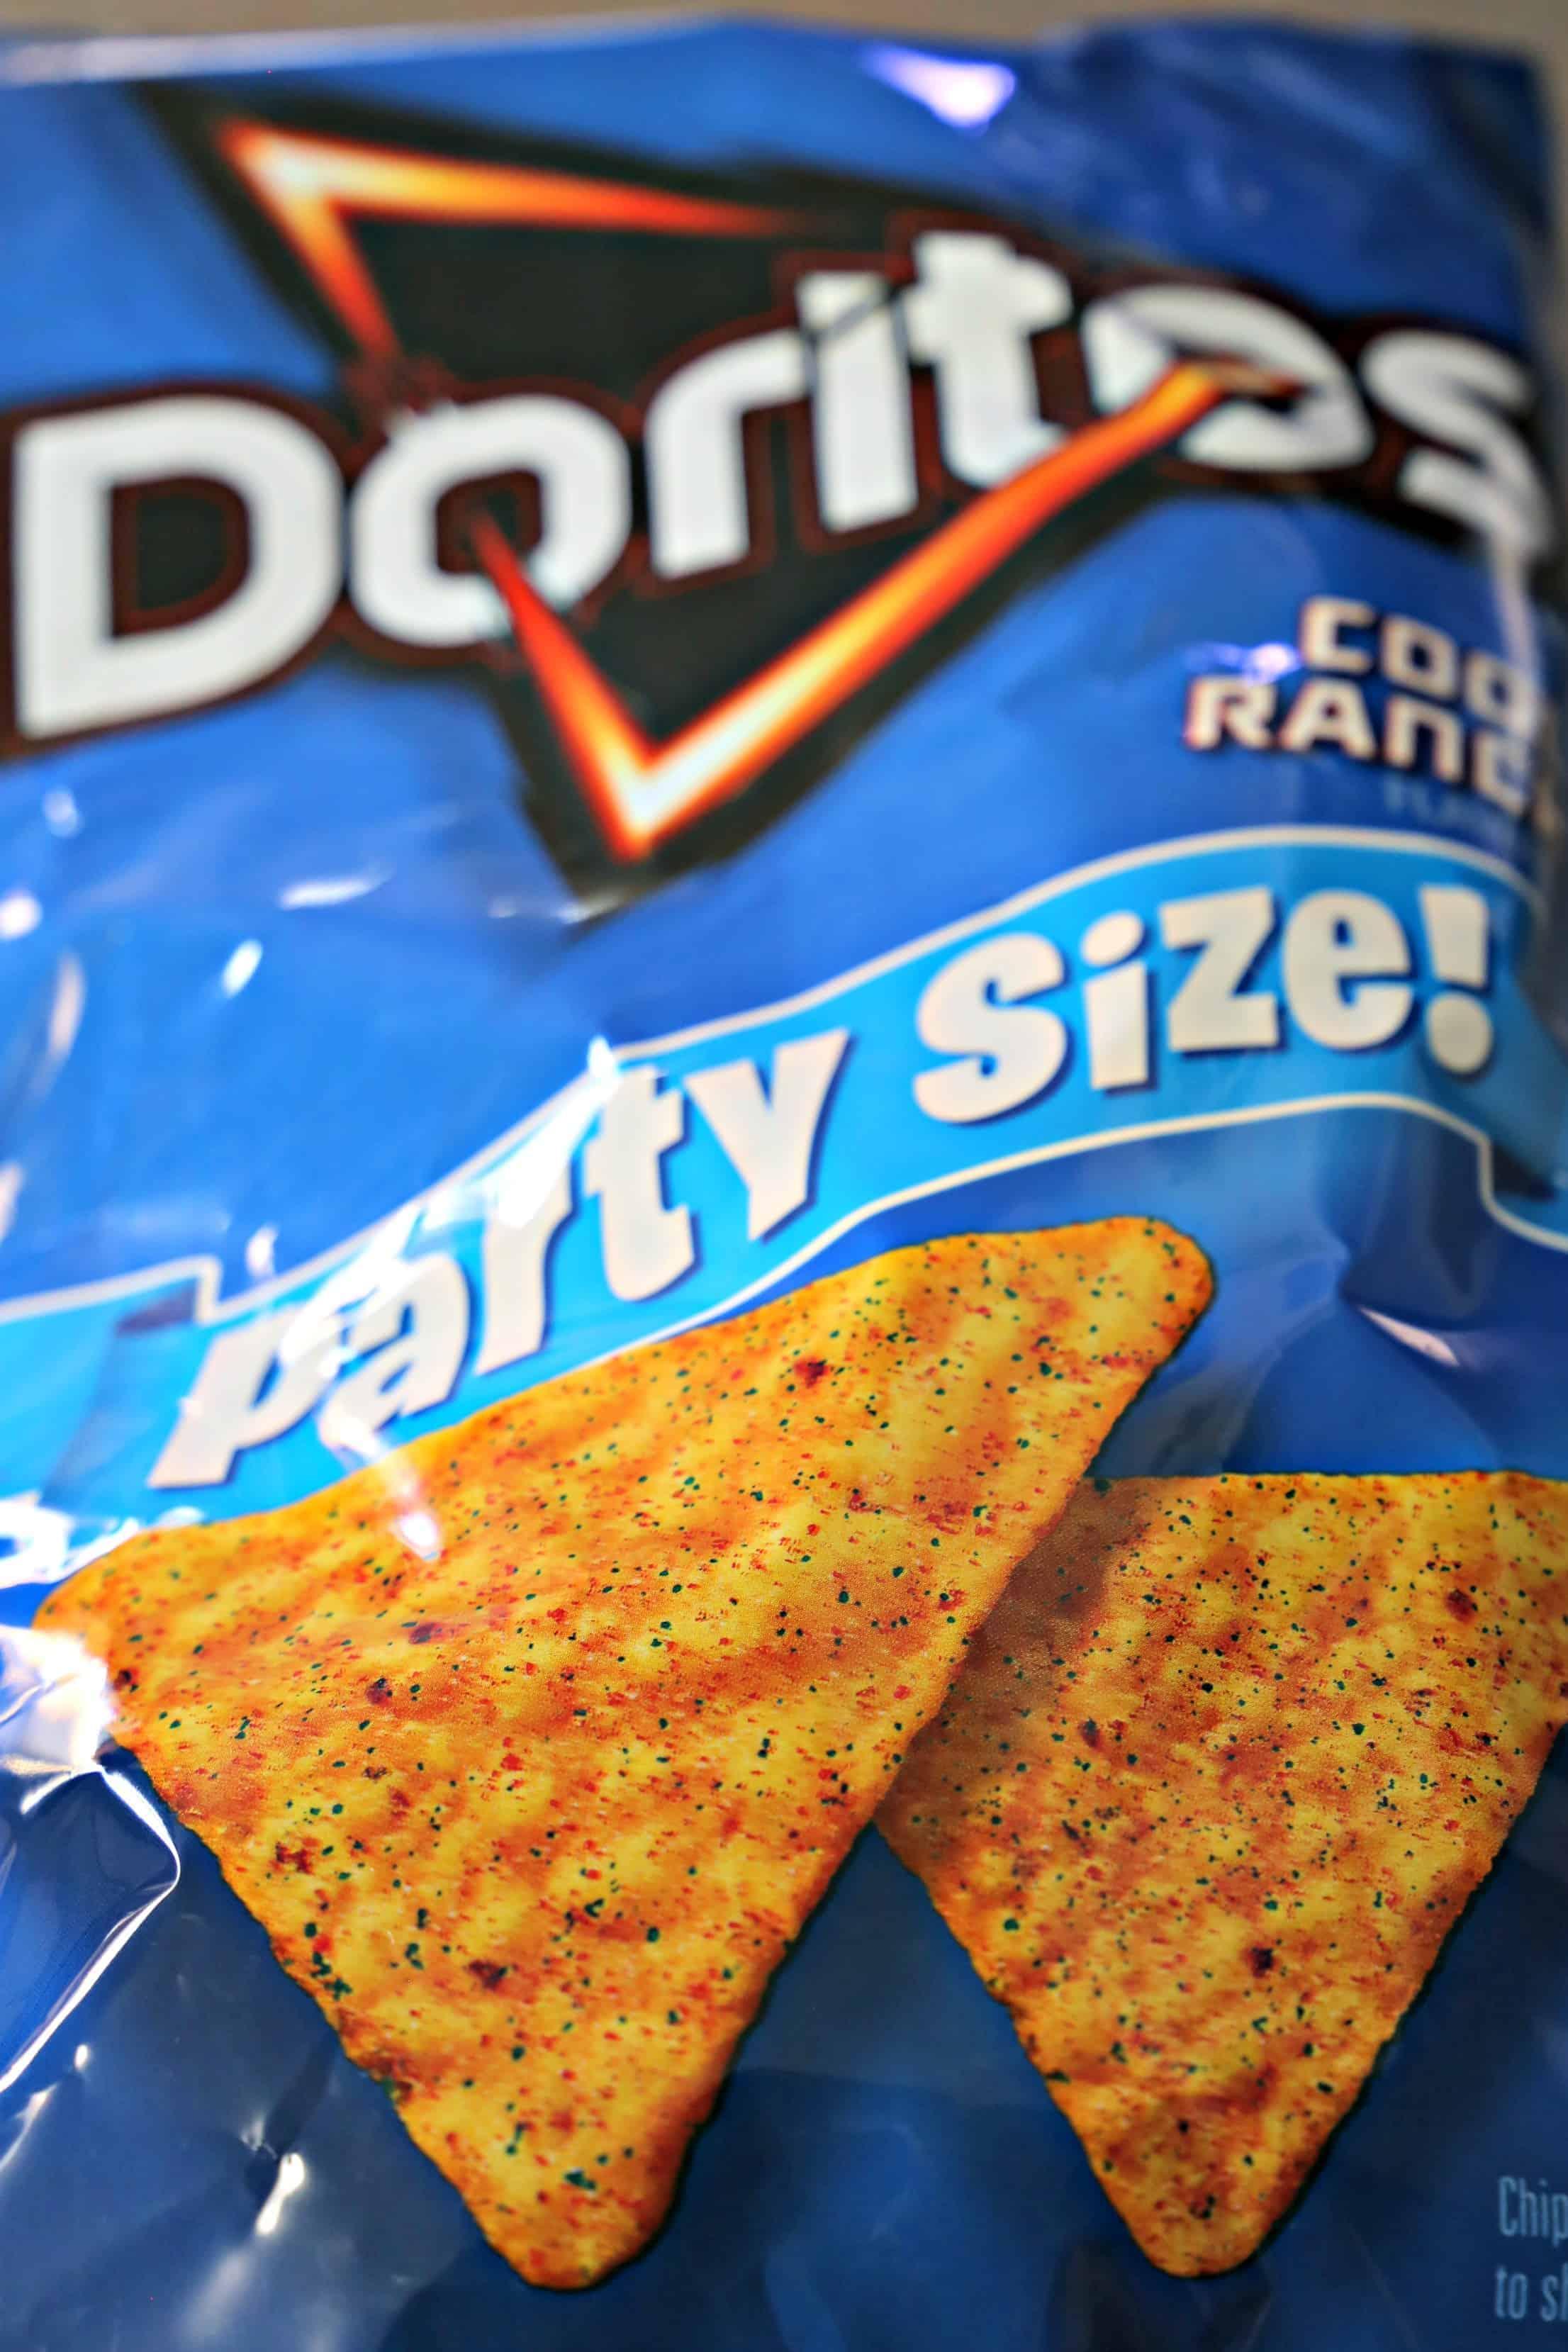 Bag of Cool Ranch Doritos